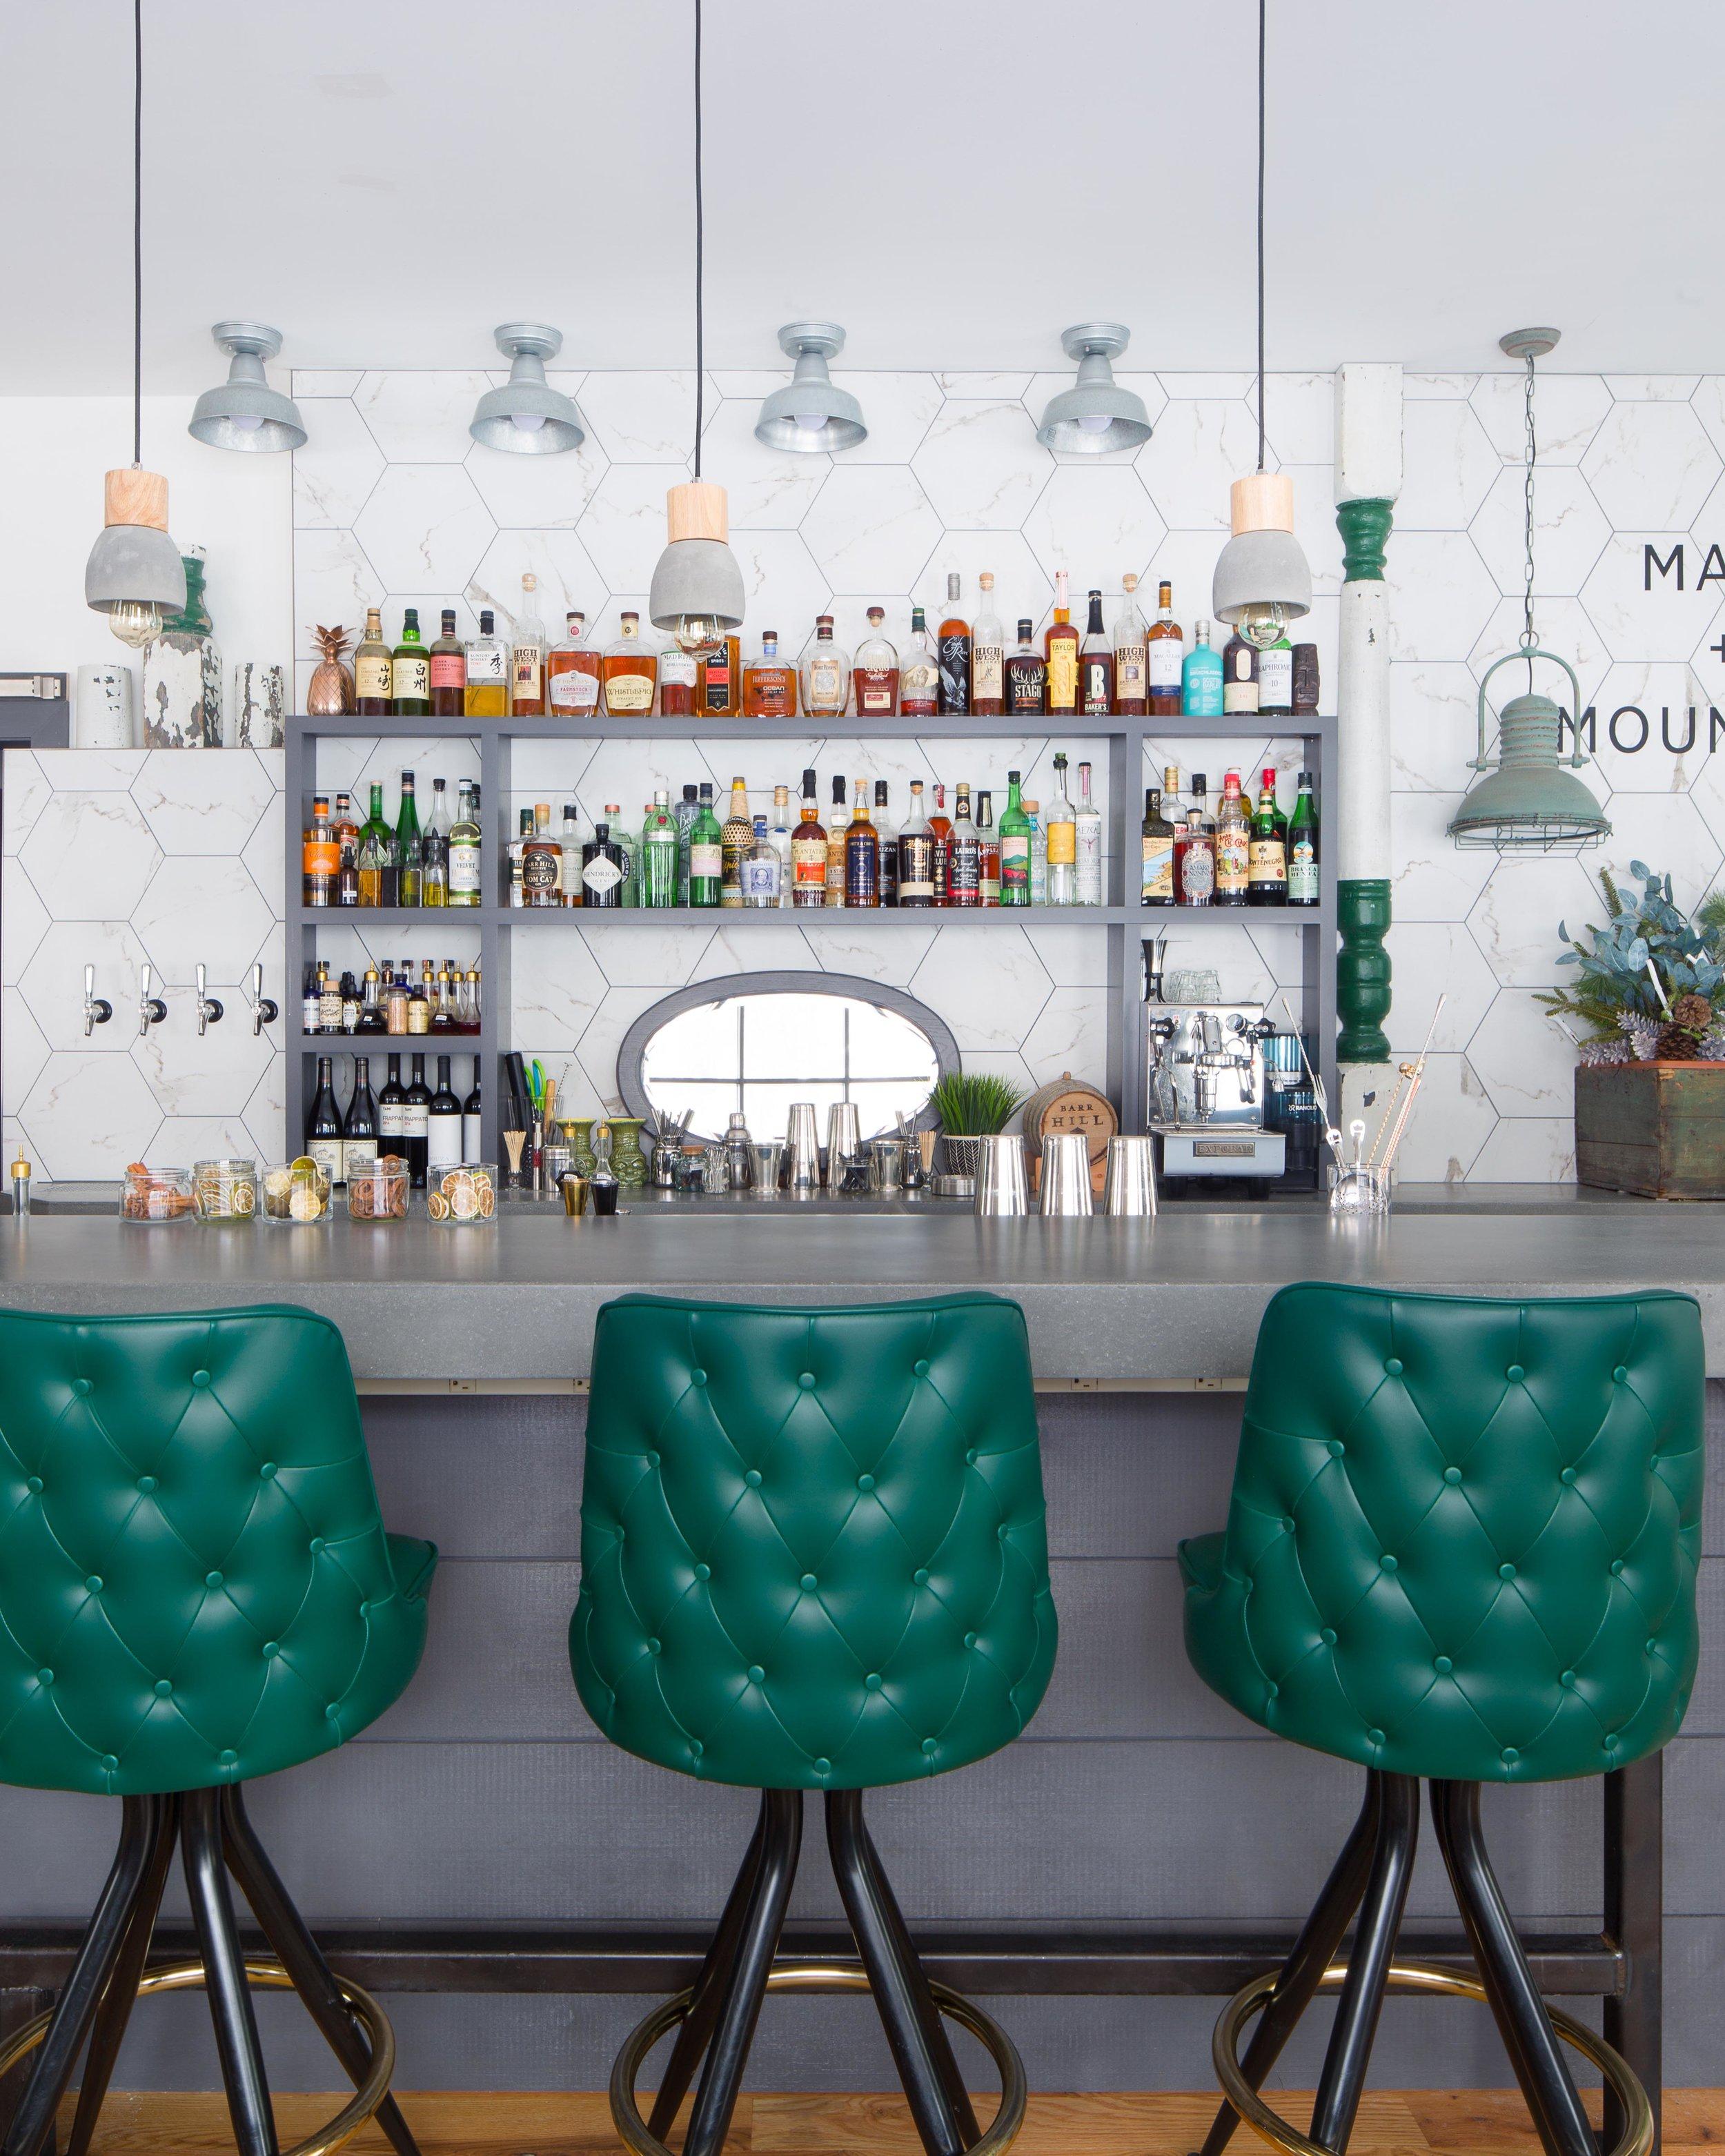 Main+Mountain Motel Bar Ludlow VT_Bar 2 (crop 4x5).jpg